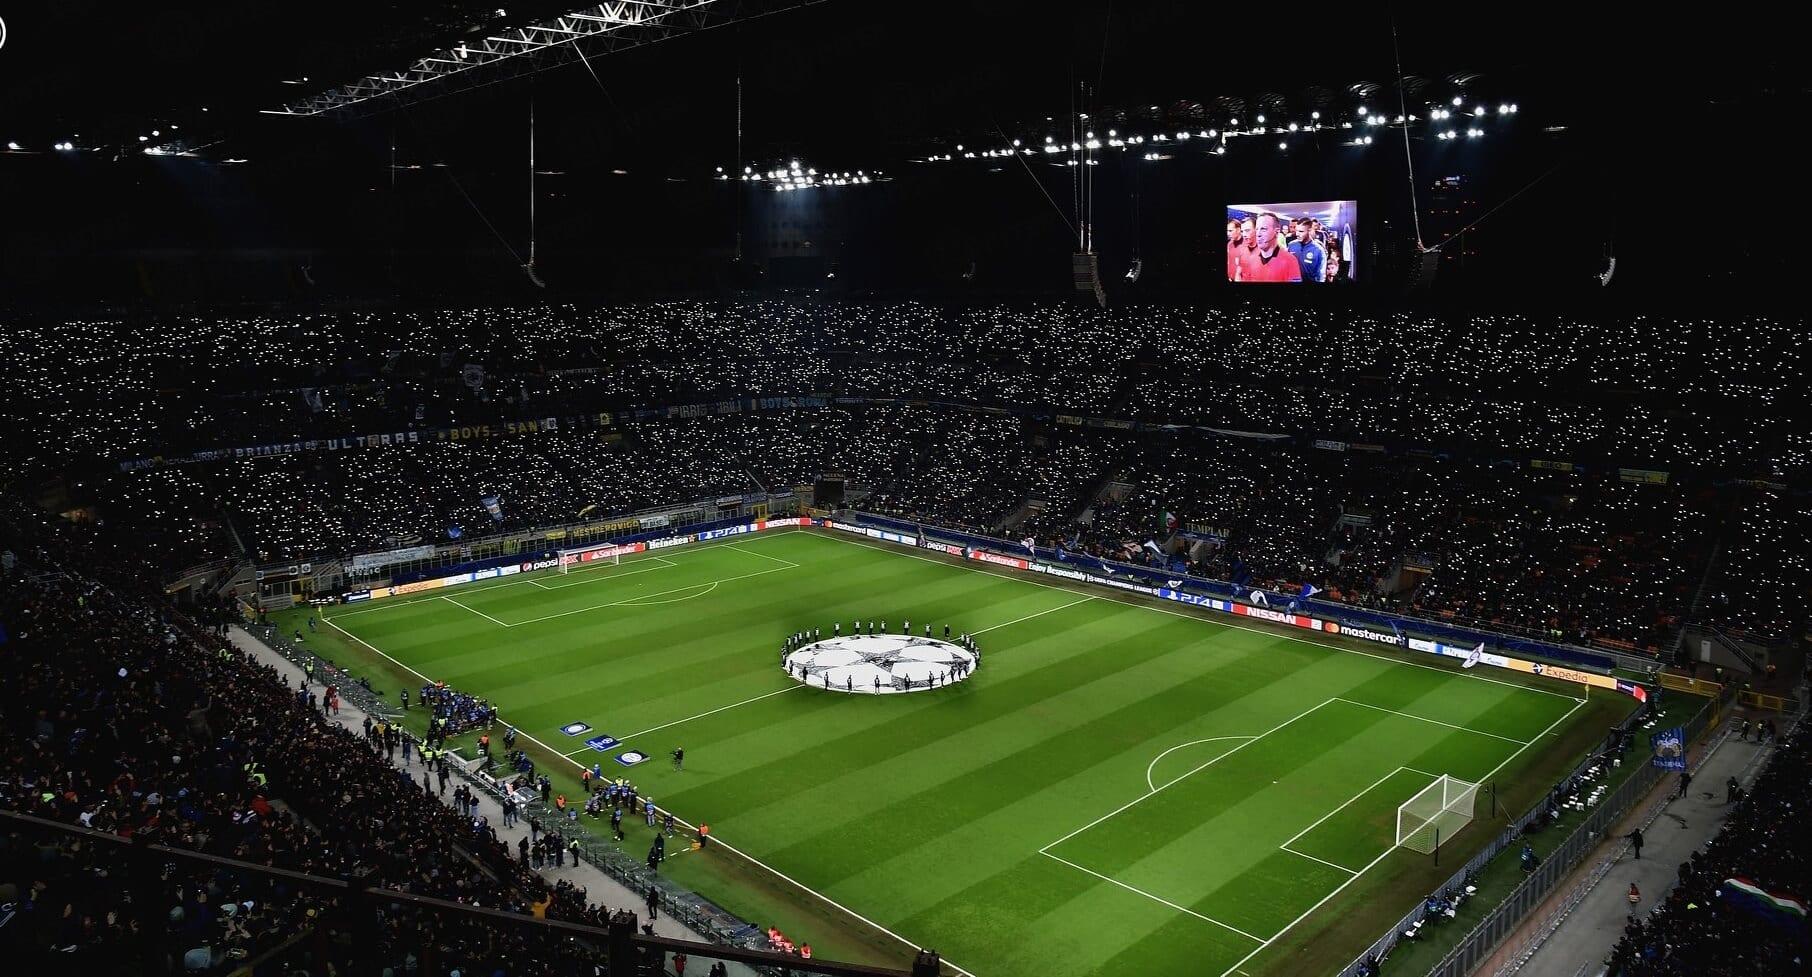 Inter stadion Liga Mistrzów